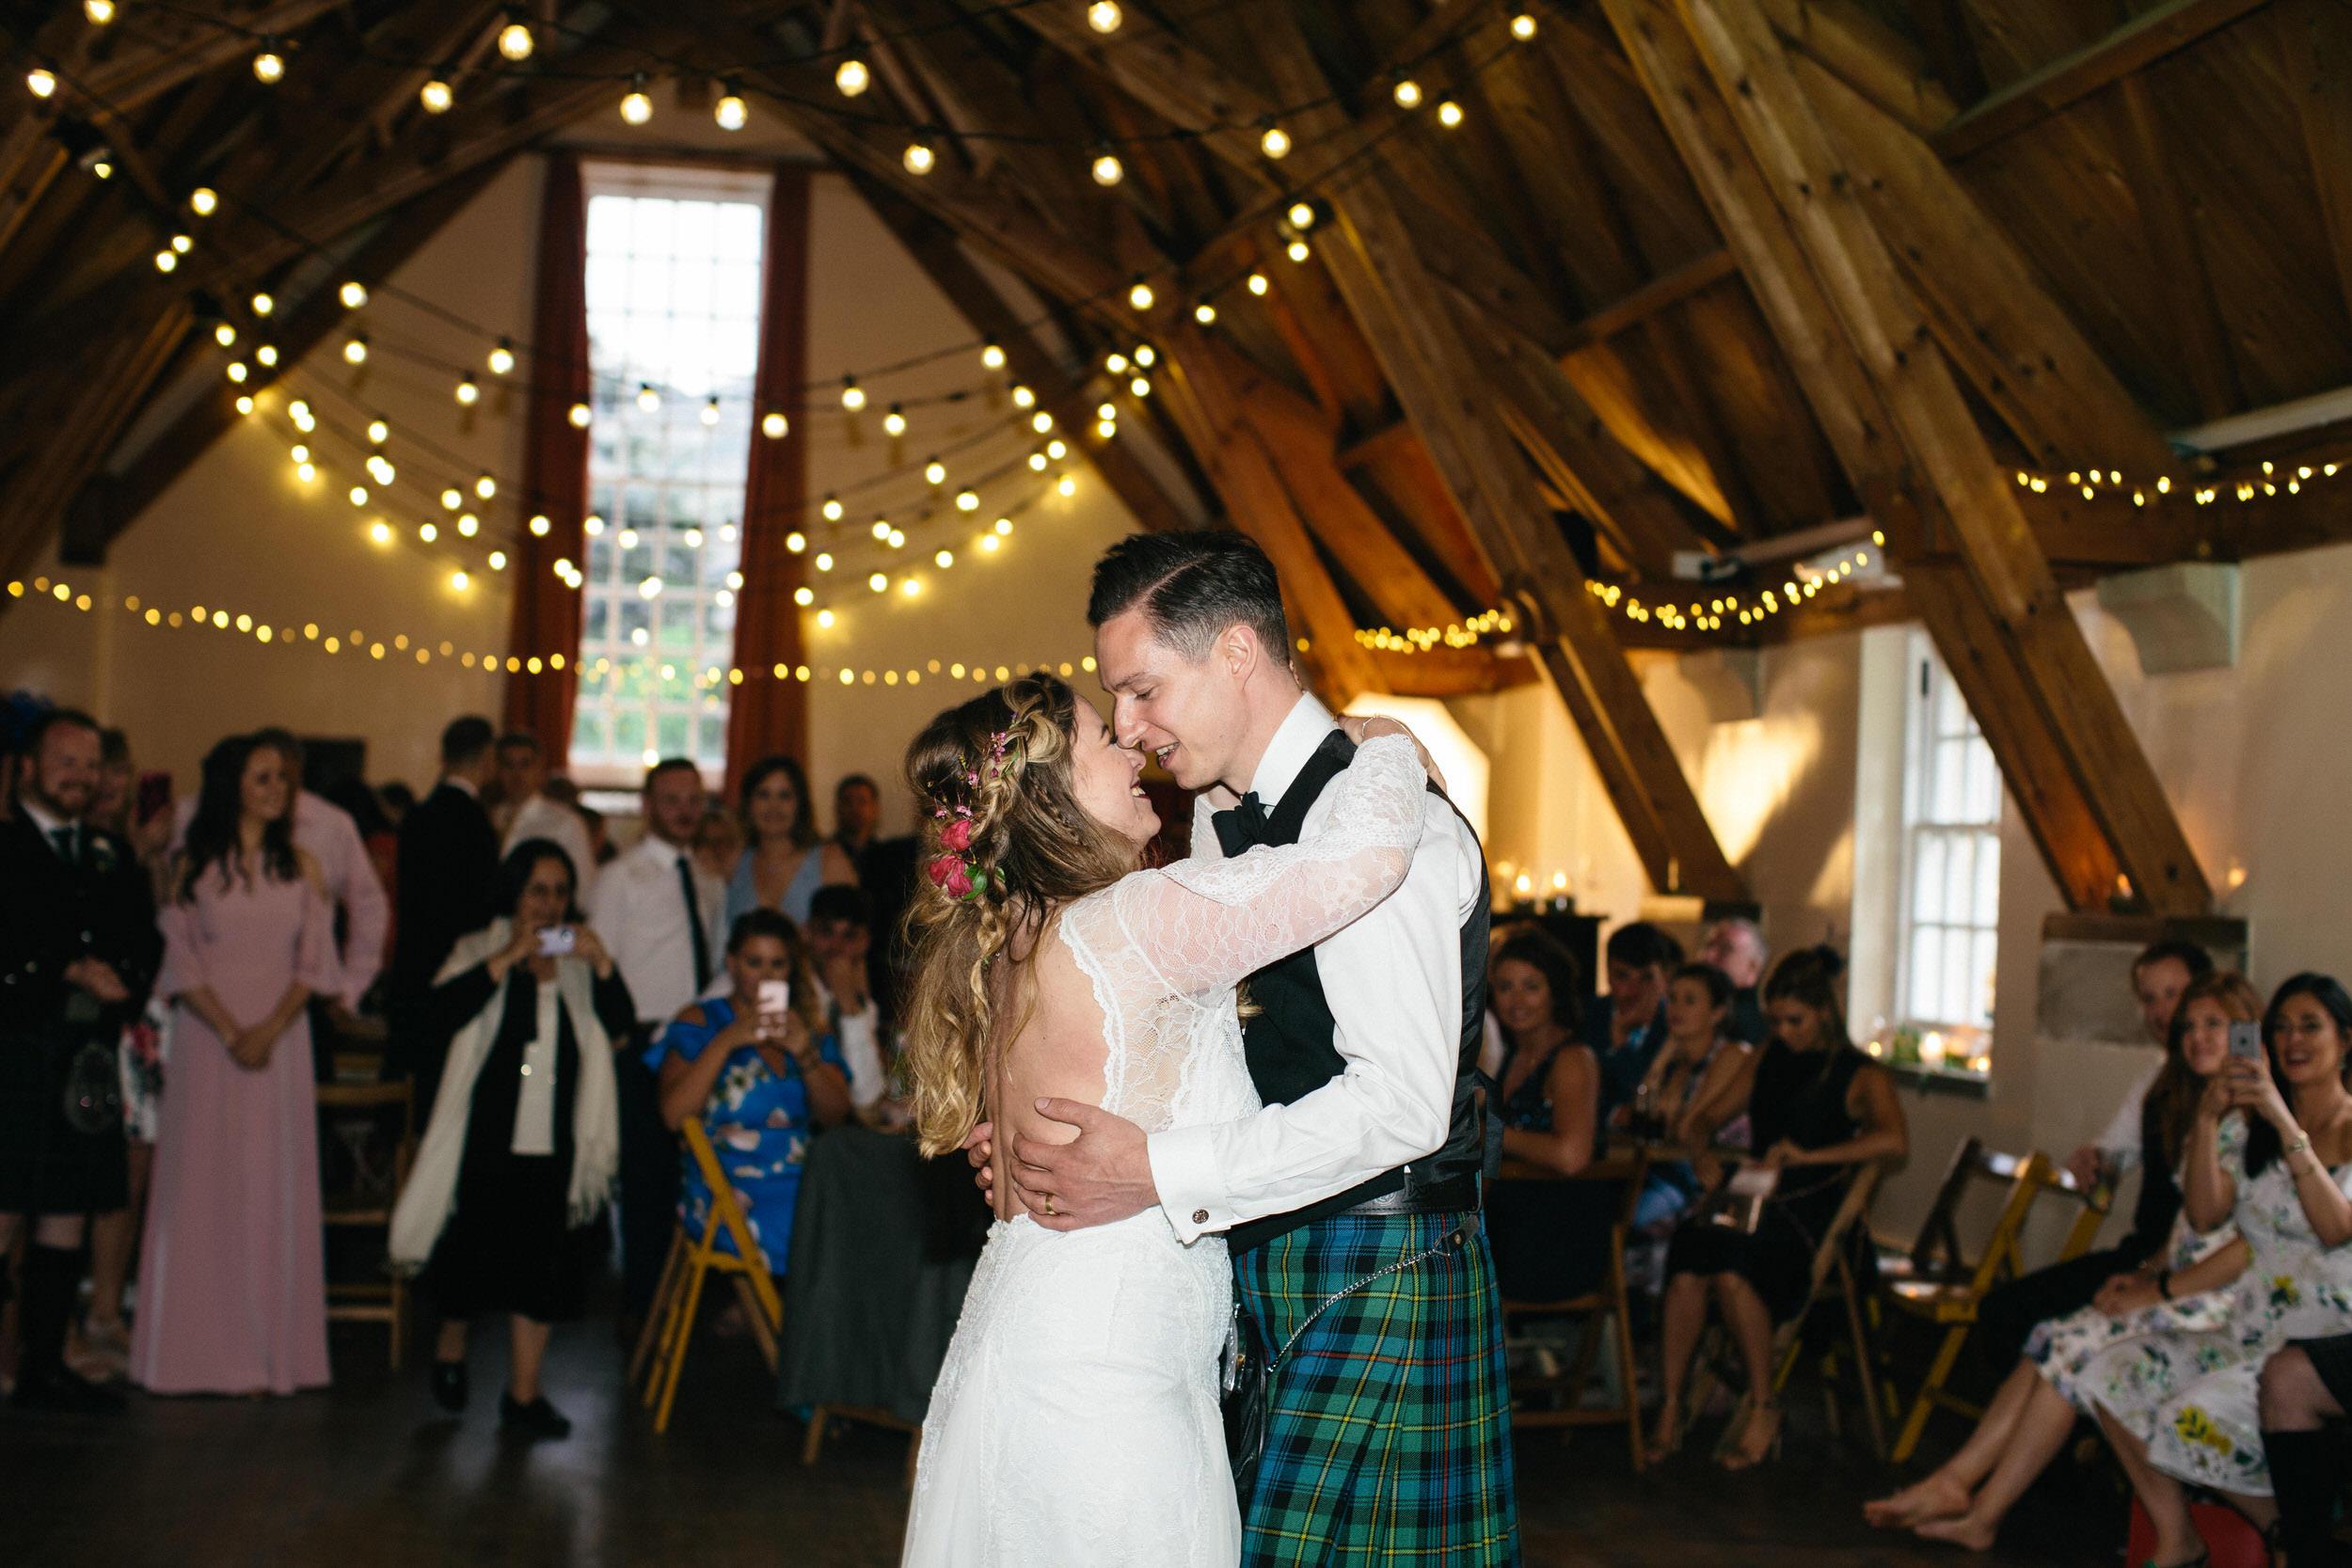 Quirky Wedding Photographer Scotland Glasgow Edinburgh Mirrorbox 224.jpg